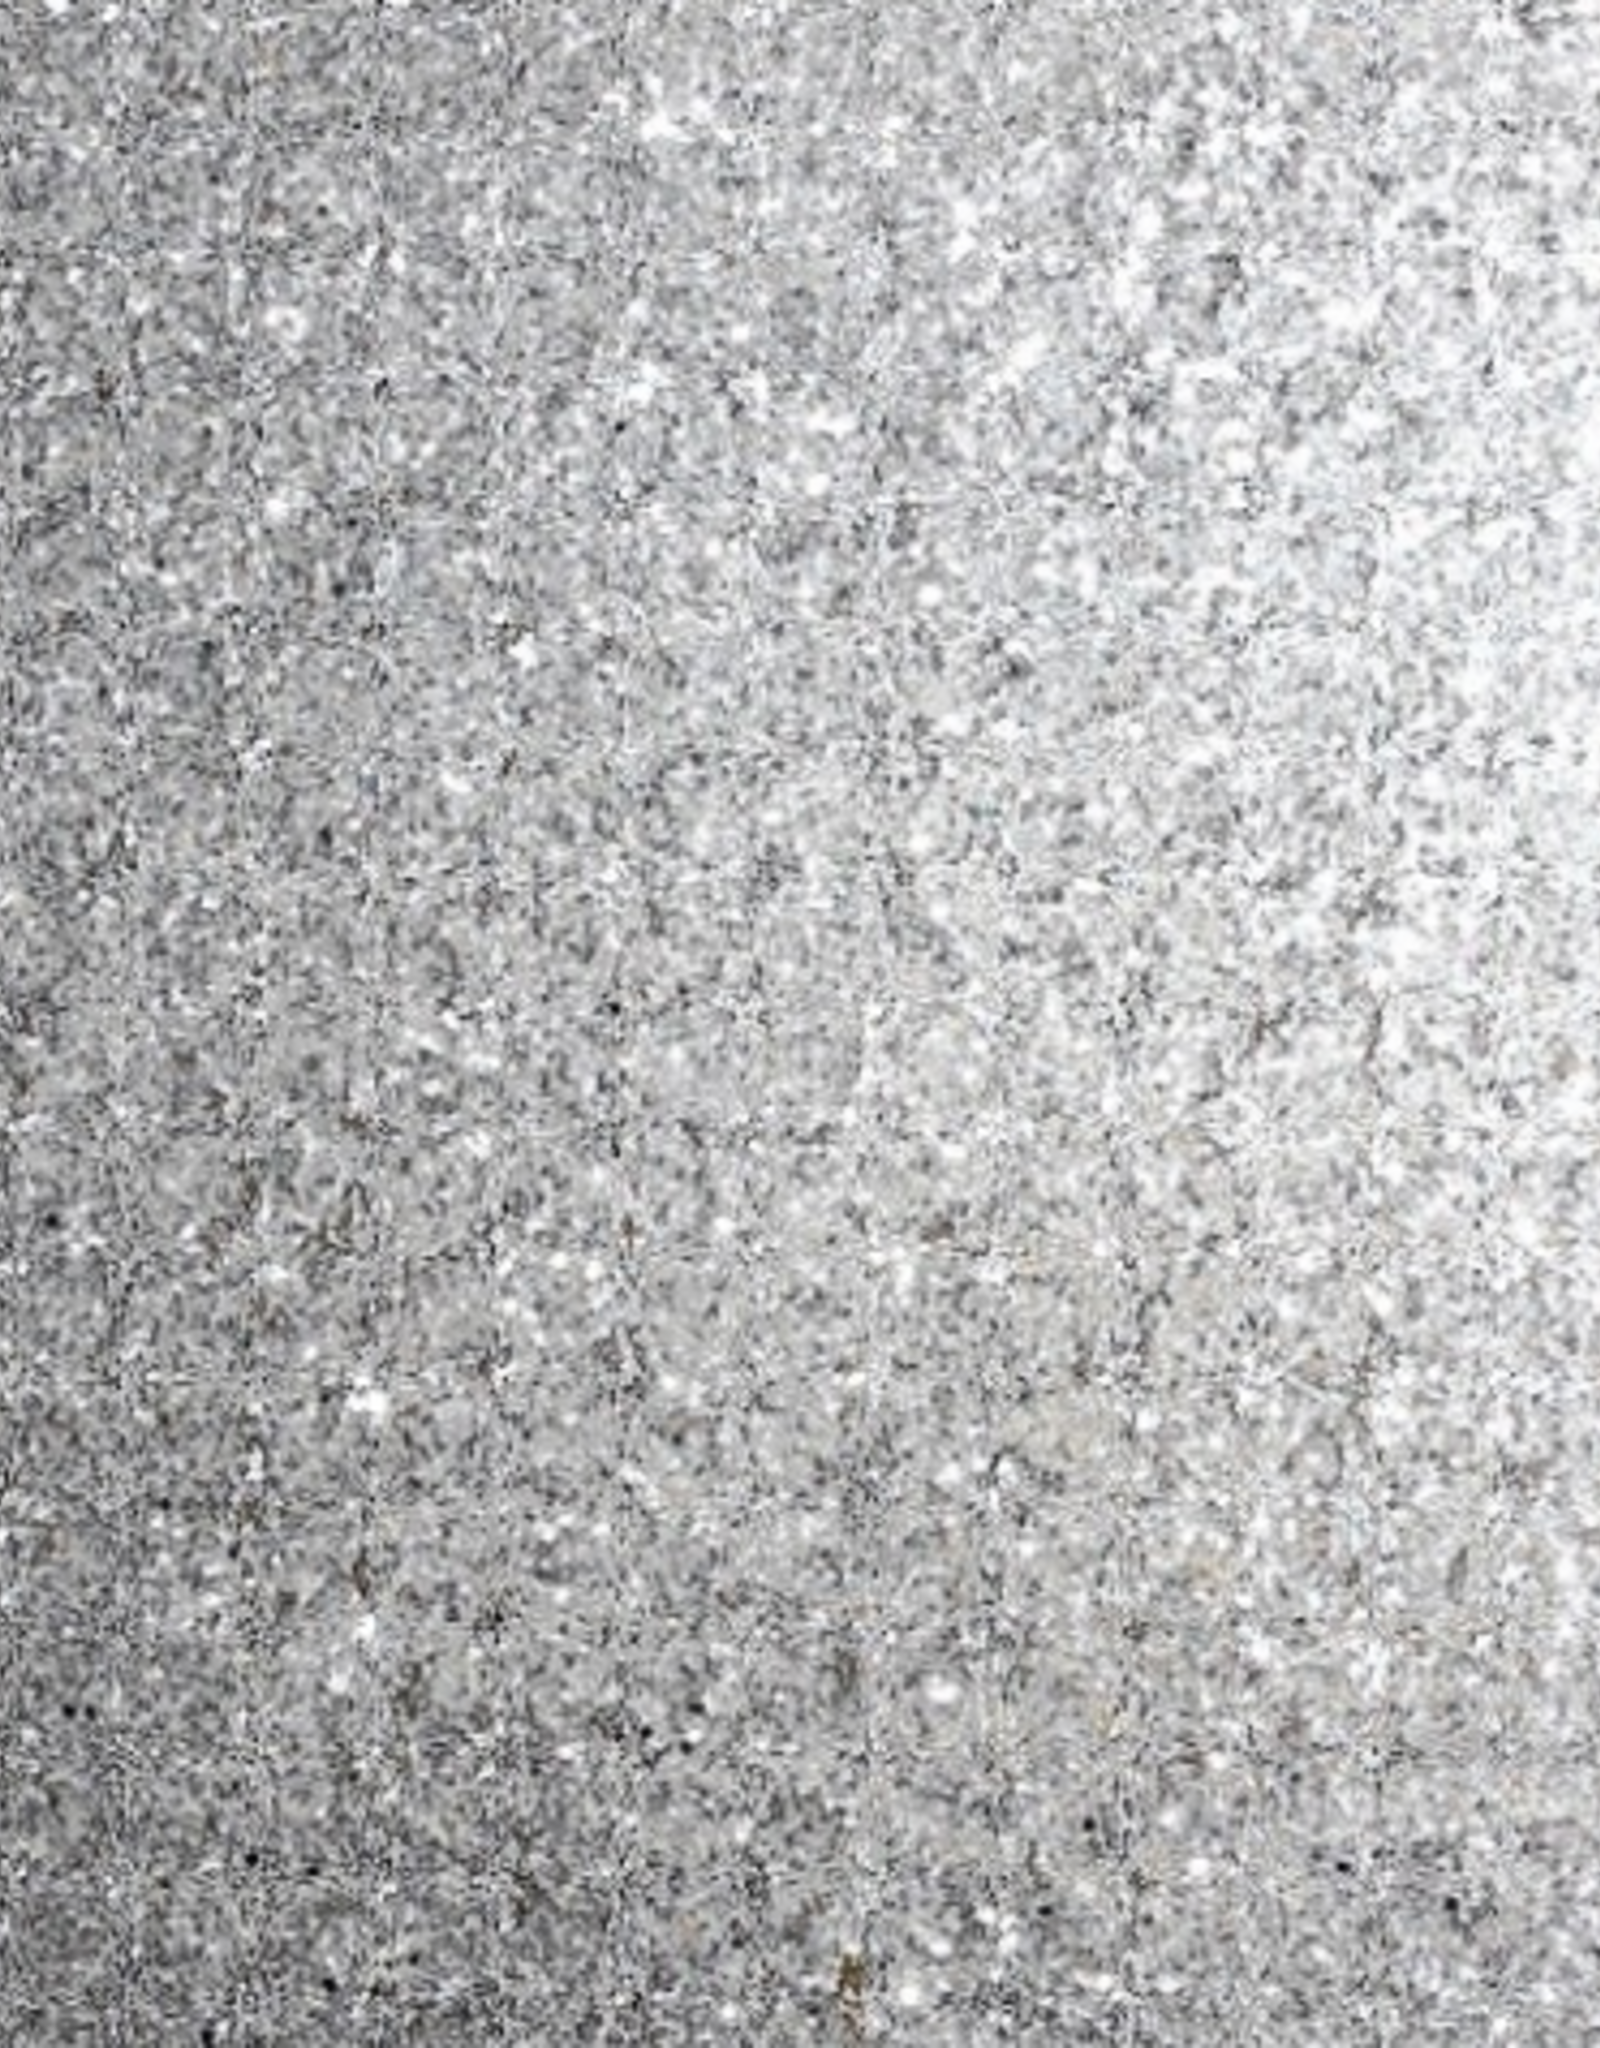 Vouwtres 20mm - Glitter Zilver